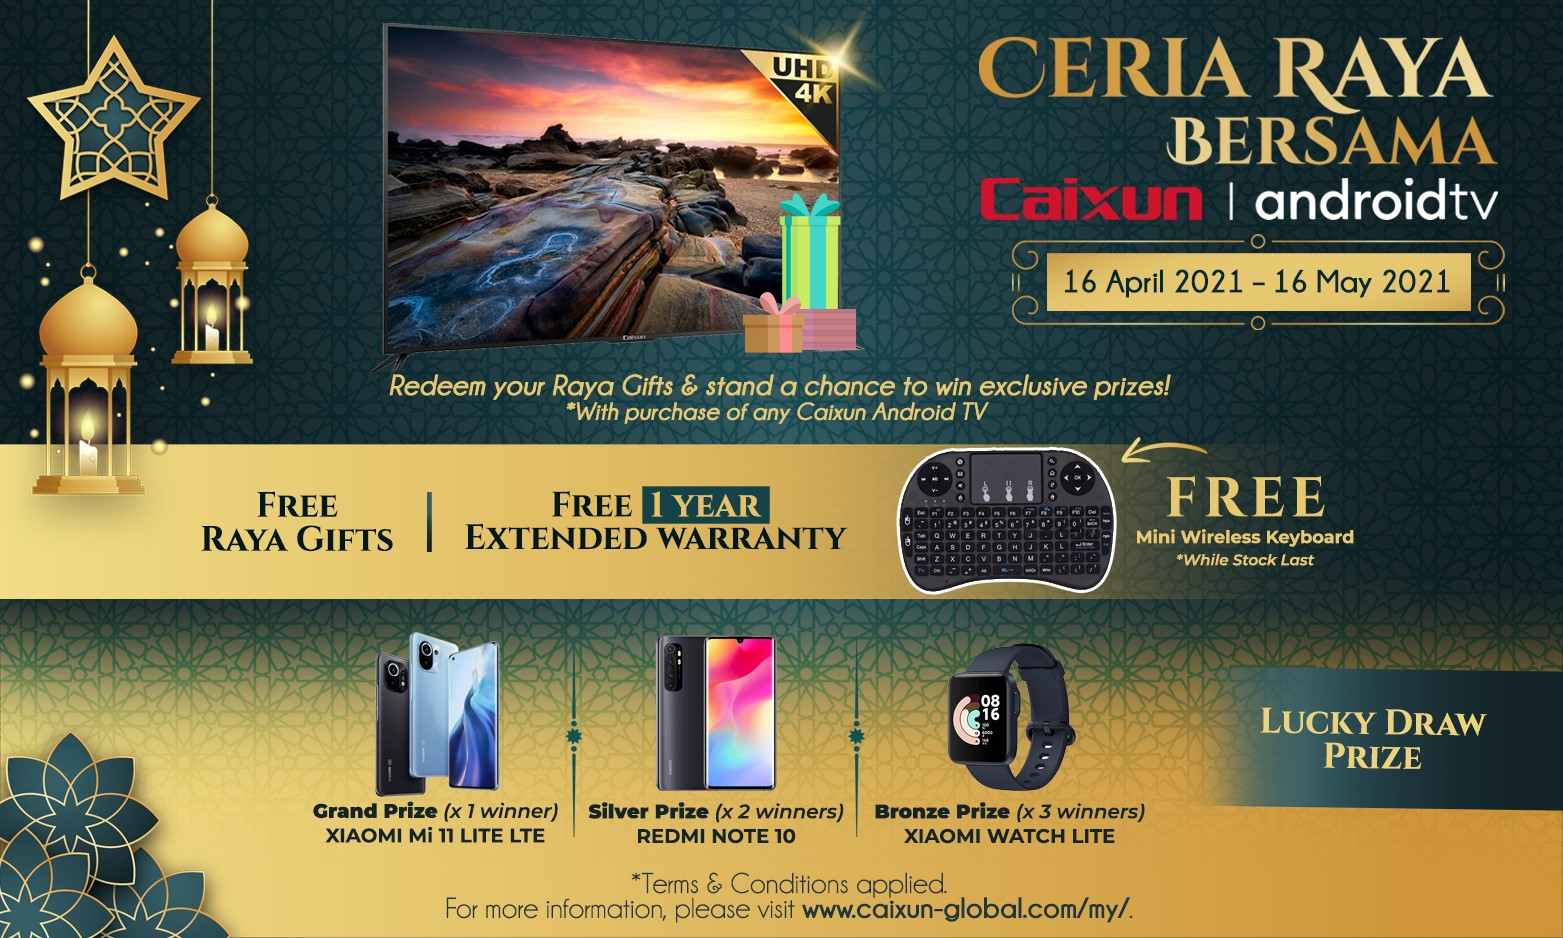 Ceria Raya bersama Caixun Malaysia!